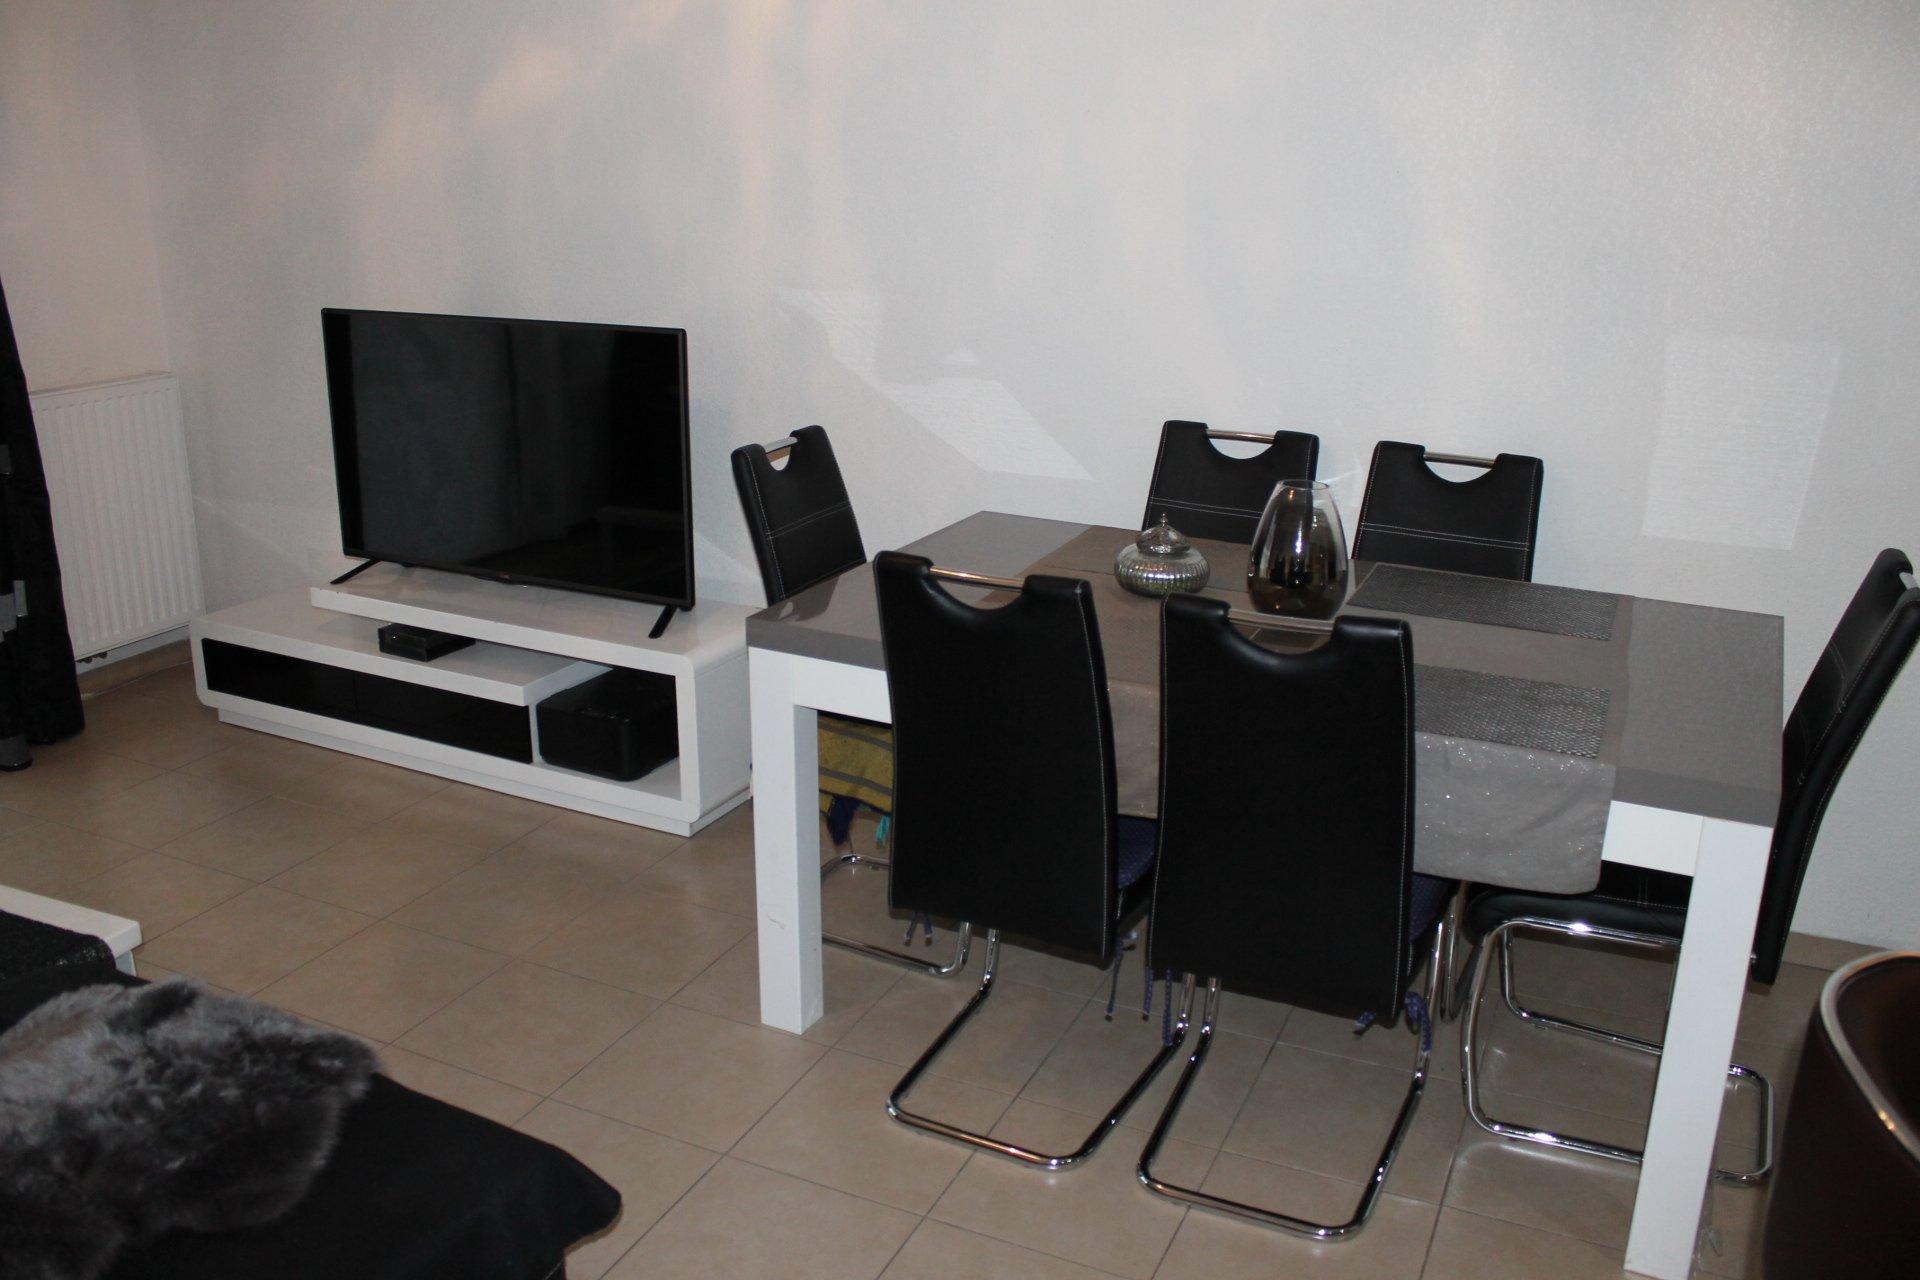 LA TRINITE : Appartement 3 Pièces